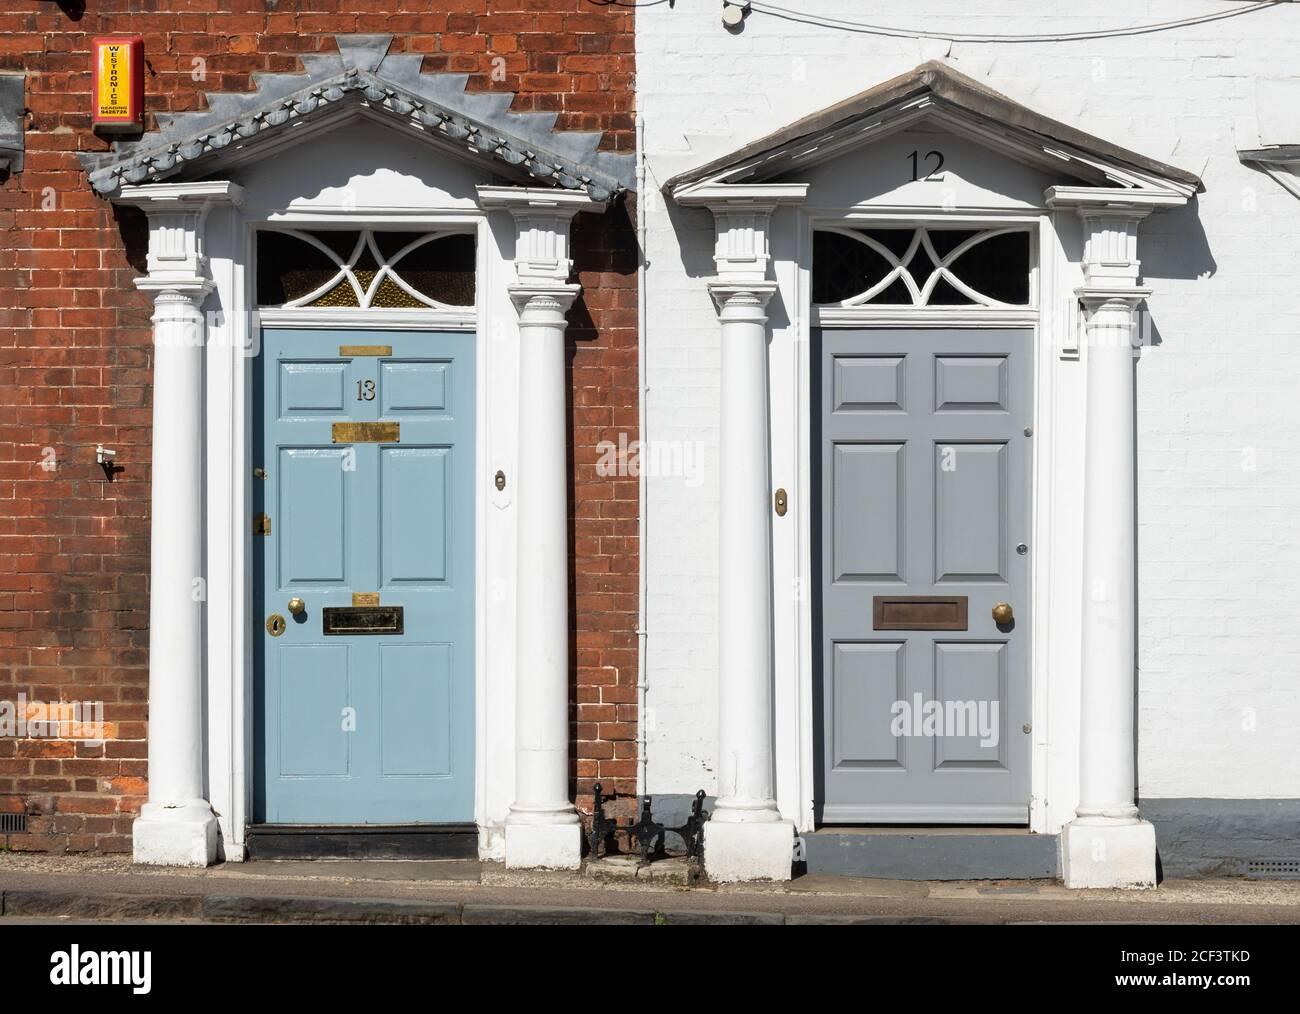 two-adjacent-ornate-front-doors-with-columns-2CF3TKD.jpg